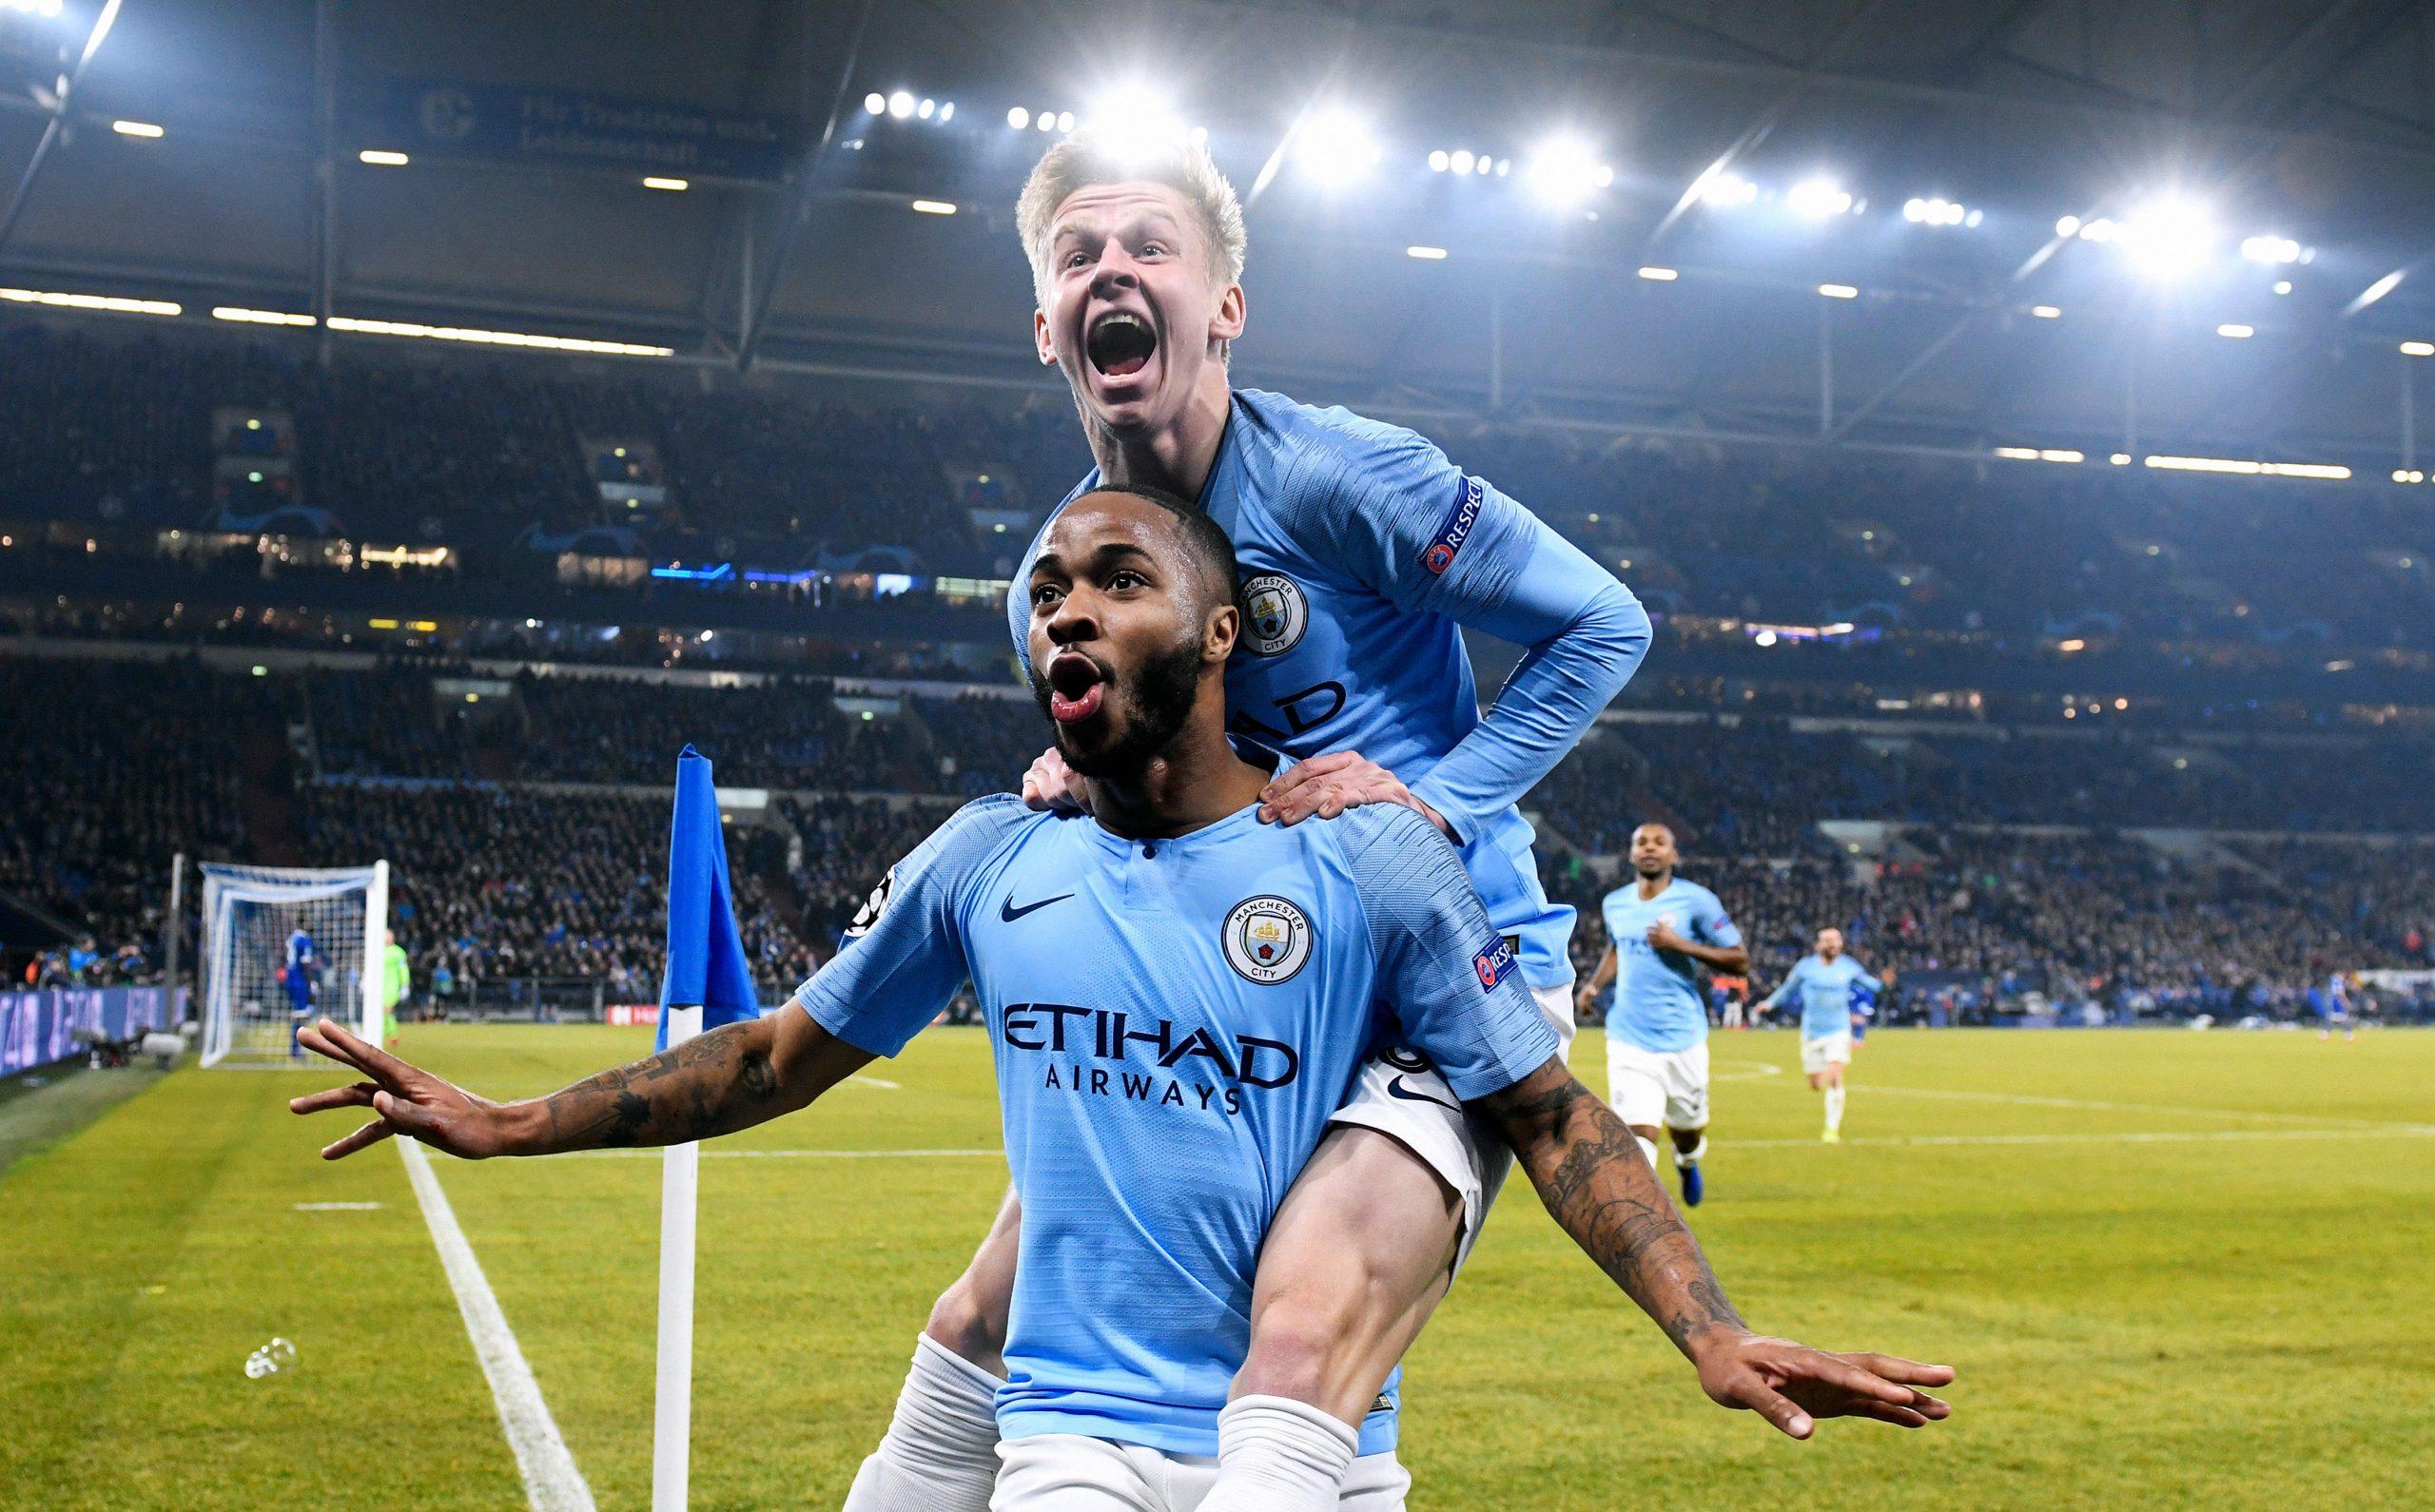 manchester city manchester united premier league stream odds speltips scaled